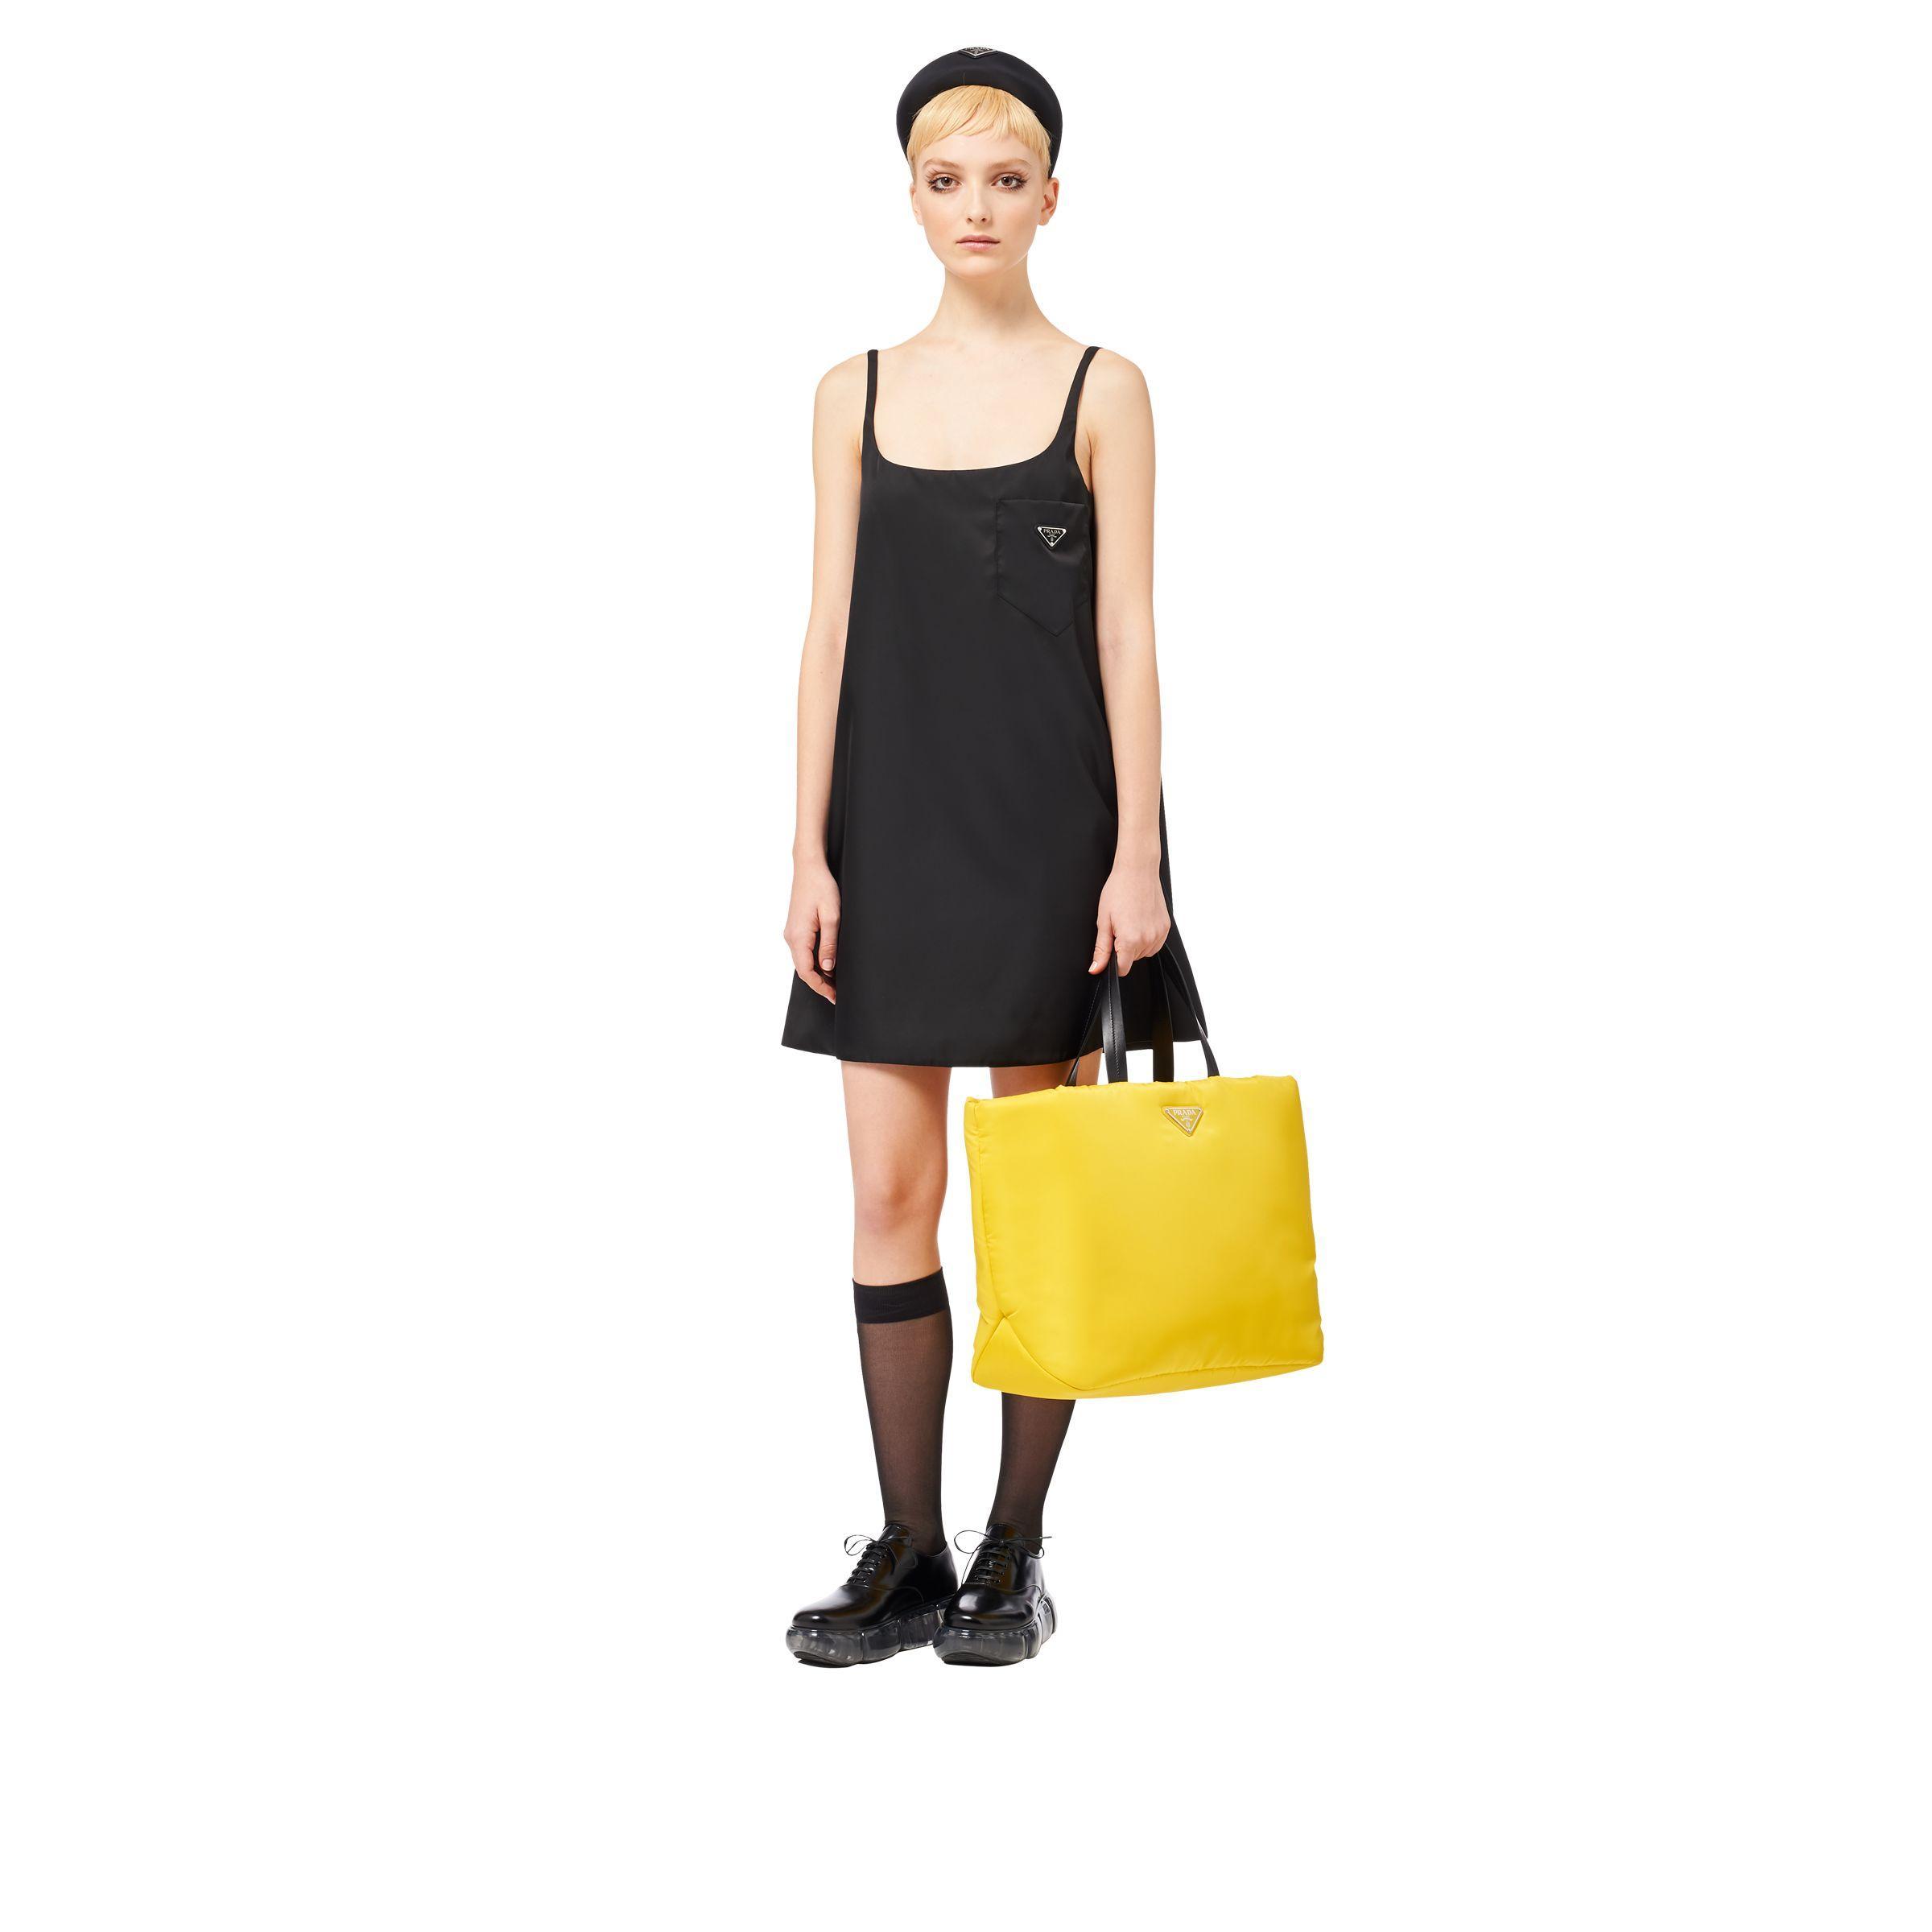 d936c4e9de Women's Yellow Medium Padded Nylon Tote